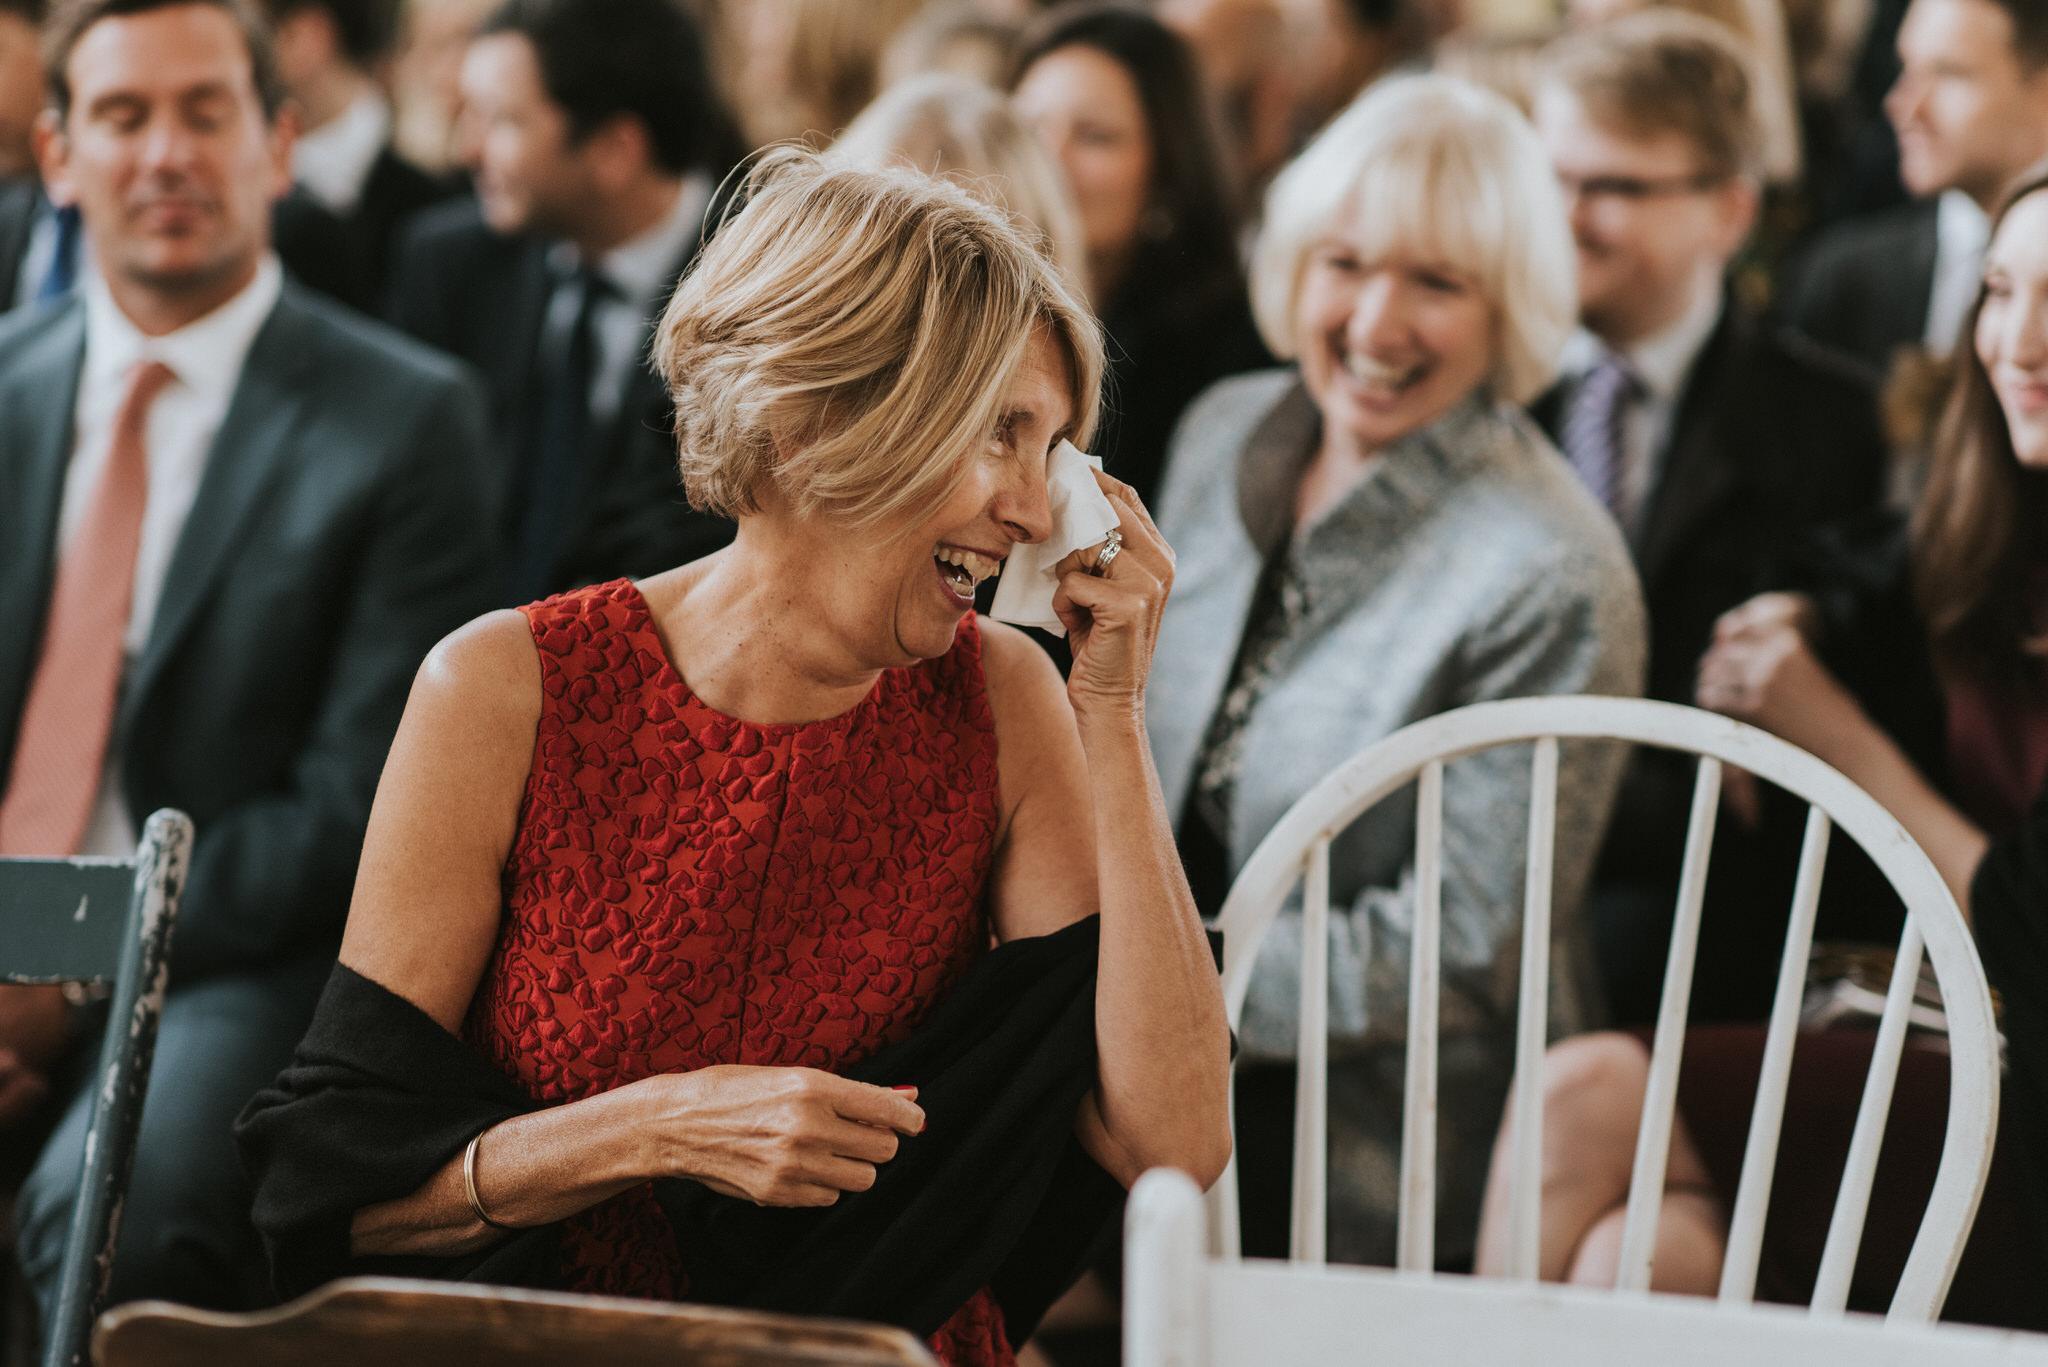 scarletoneillphotography_weddingphotography_prince edward county weddings105.JPG